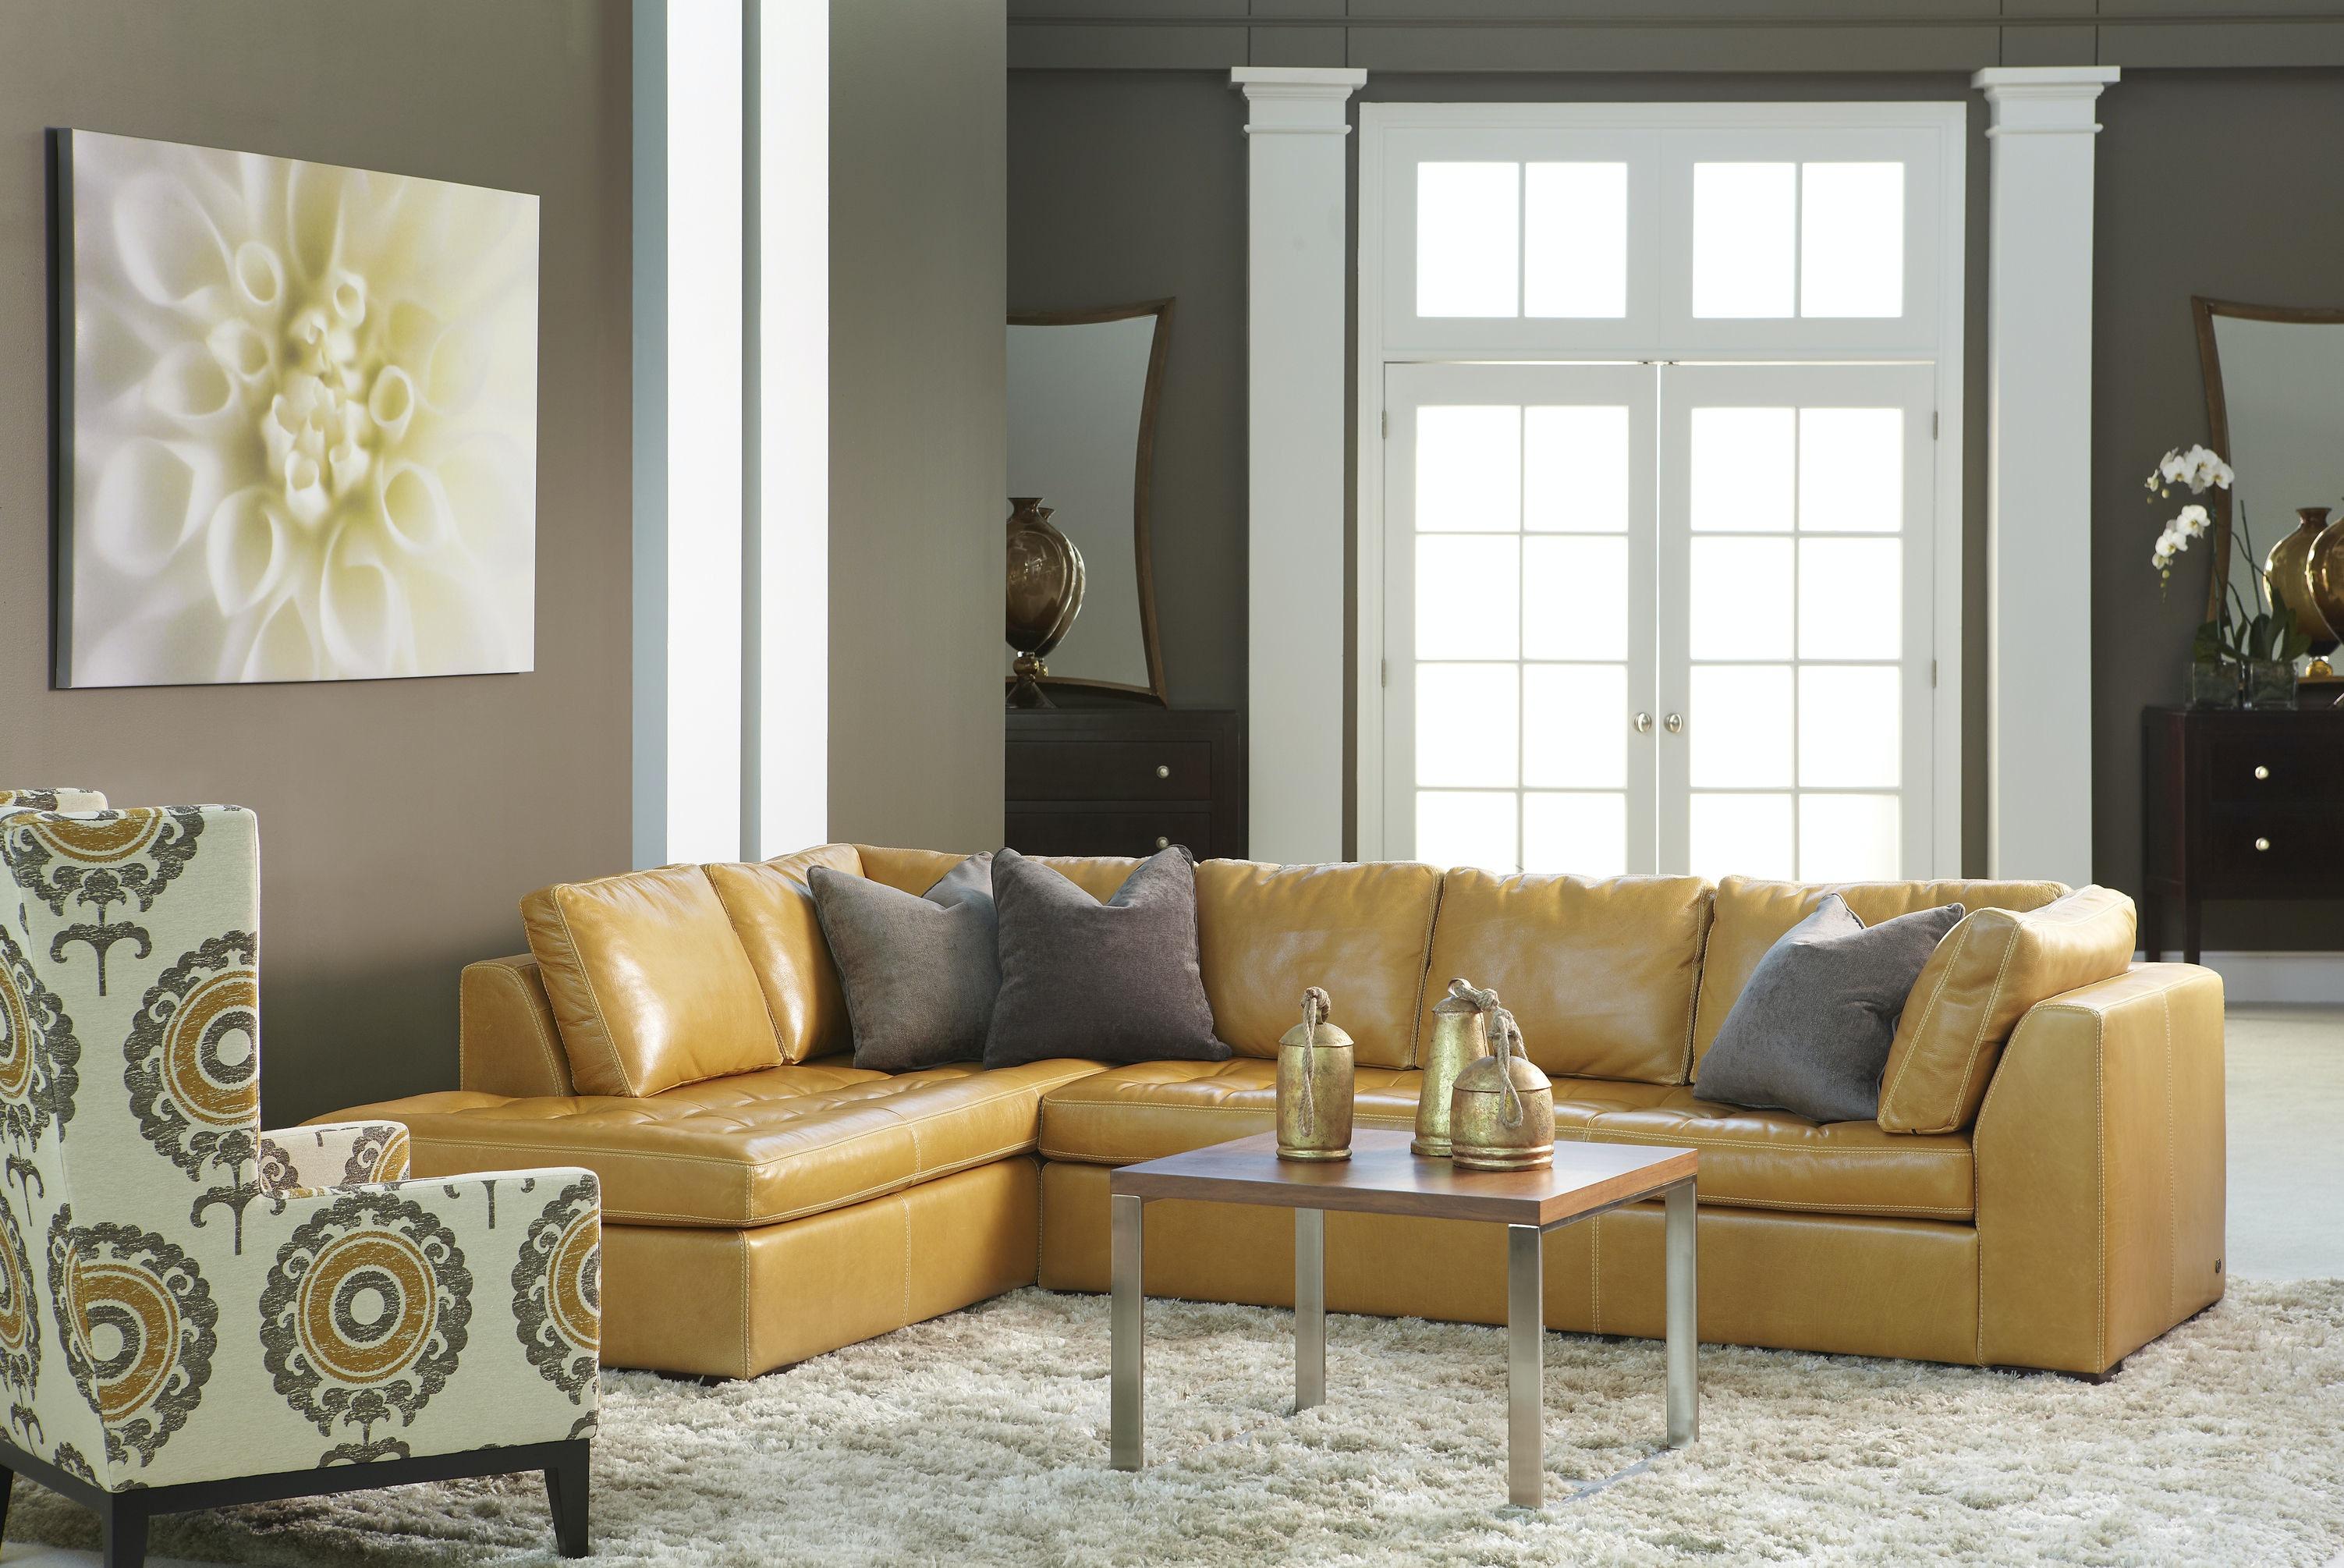 Sectional priba furniture and interiors greensboro north carolina